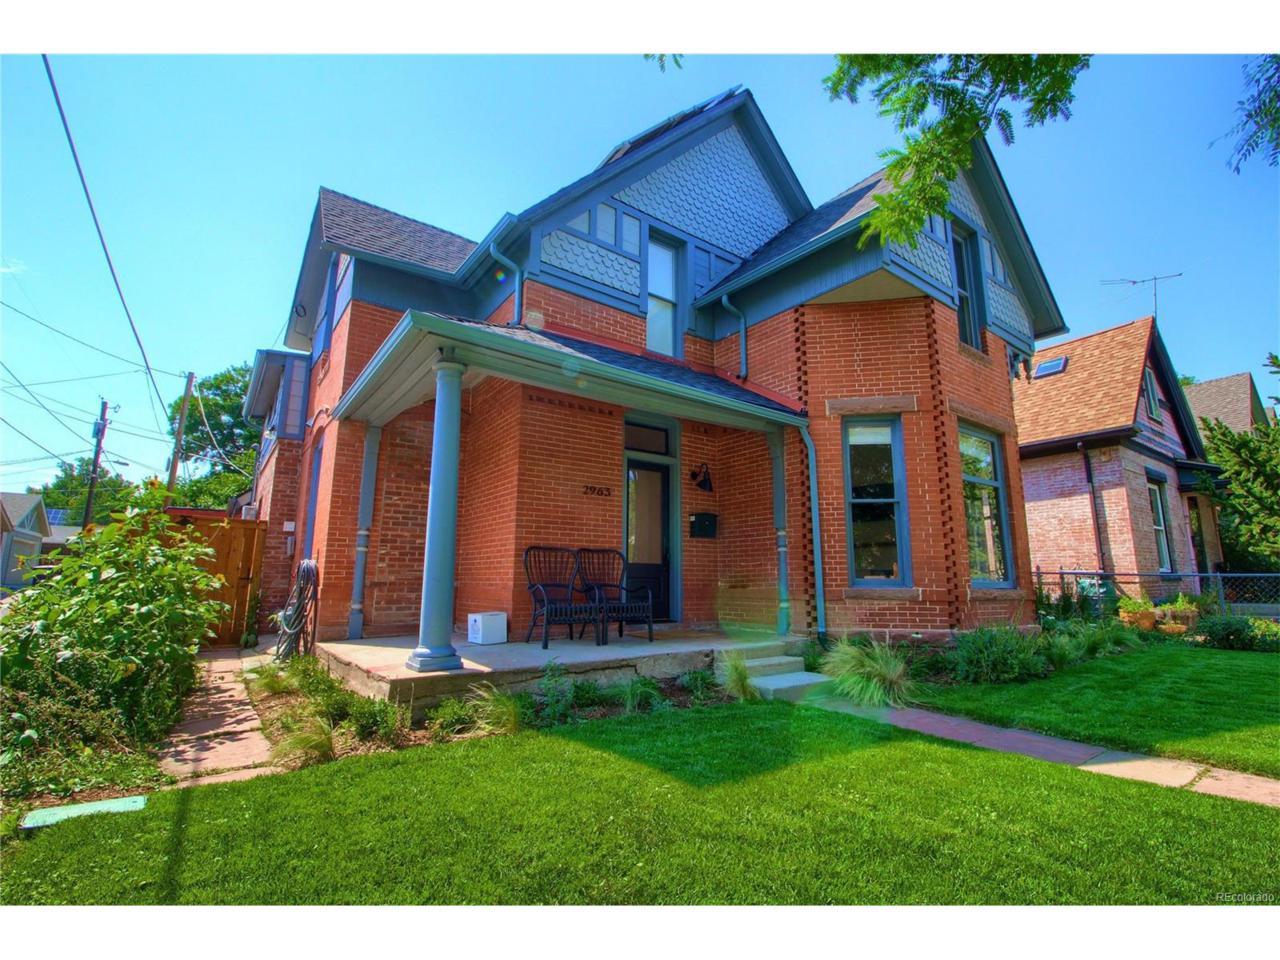 2963 Julian Street, Denver, CO 80211 (MLS #4484352) :: 8z Real Estate